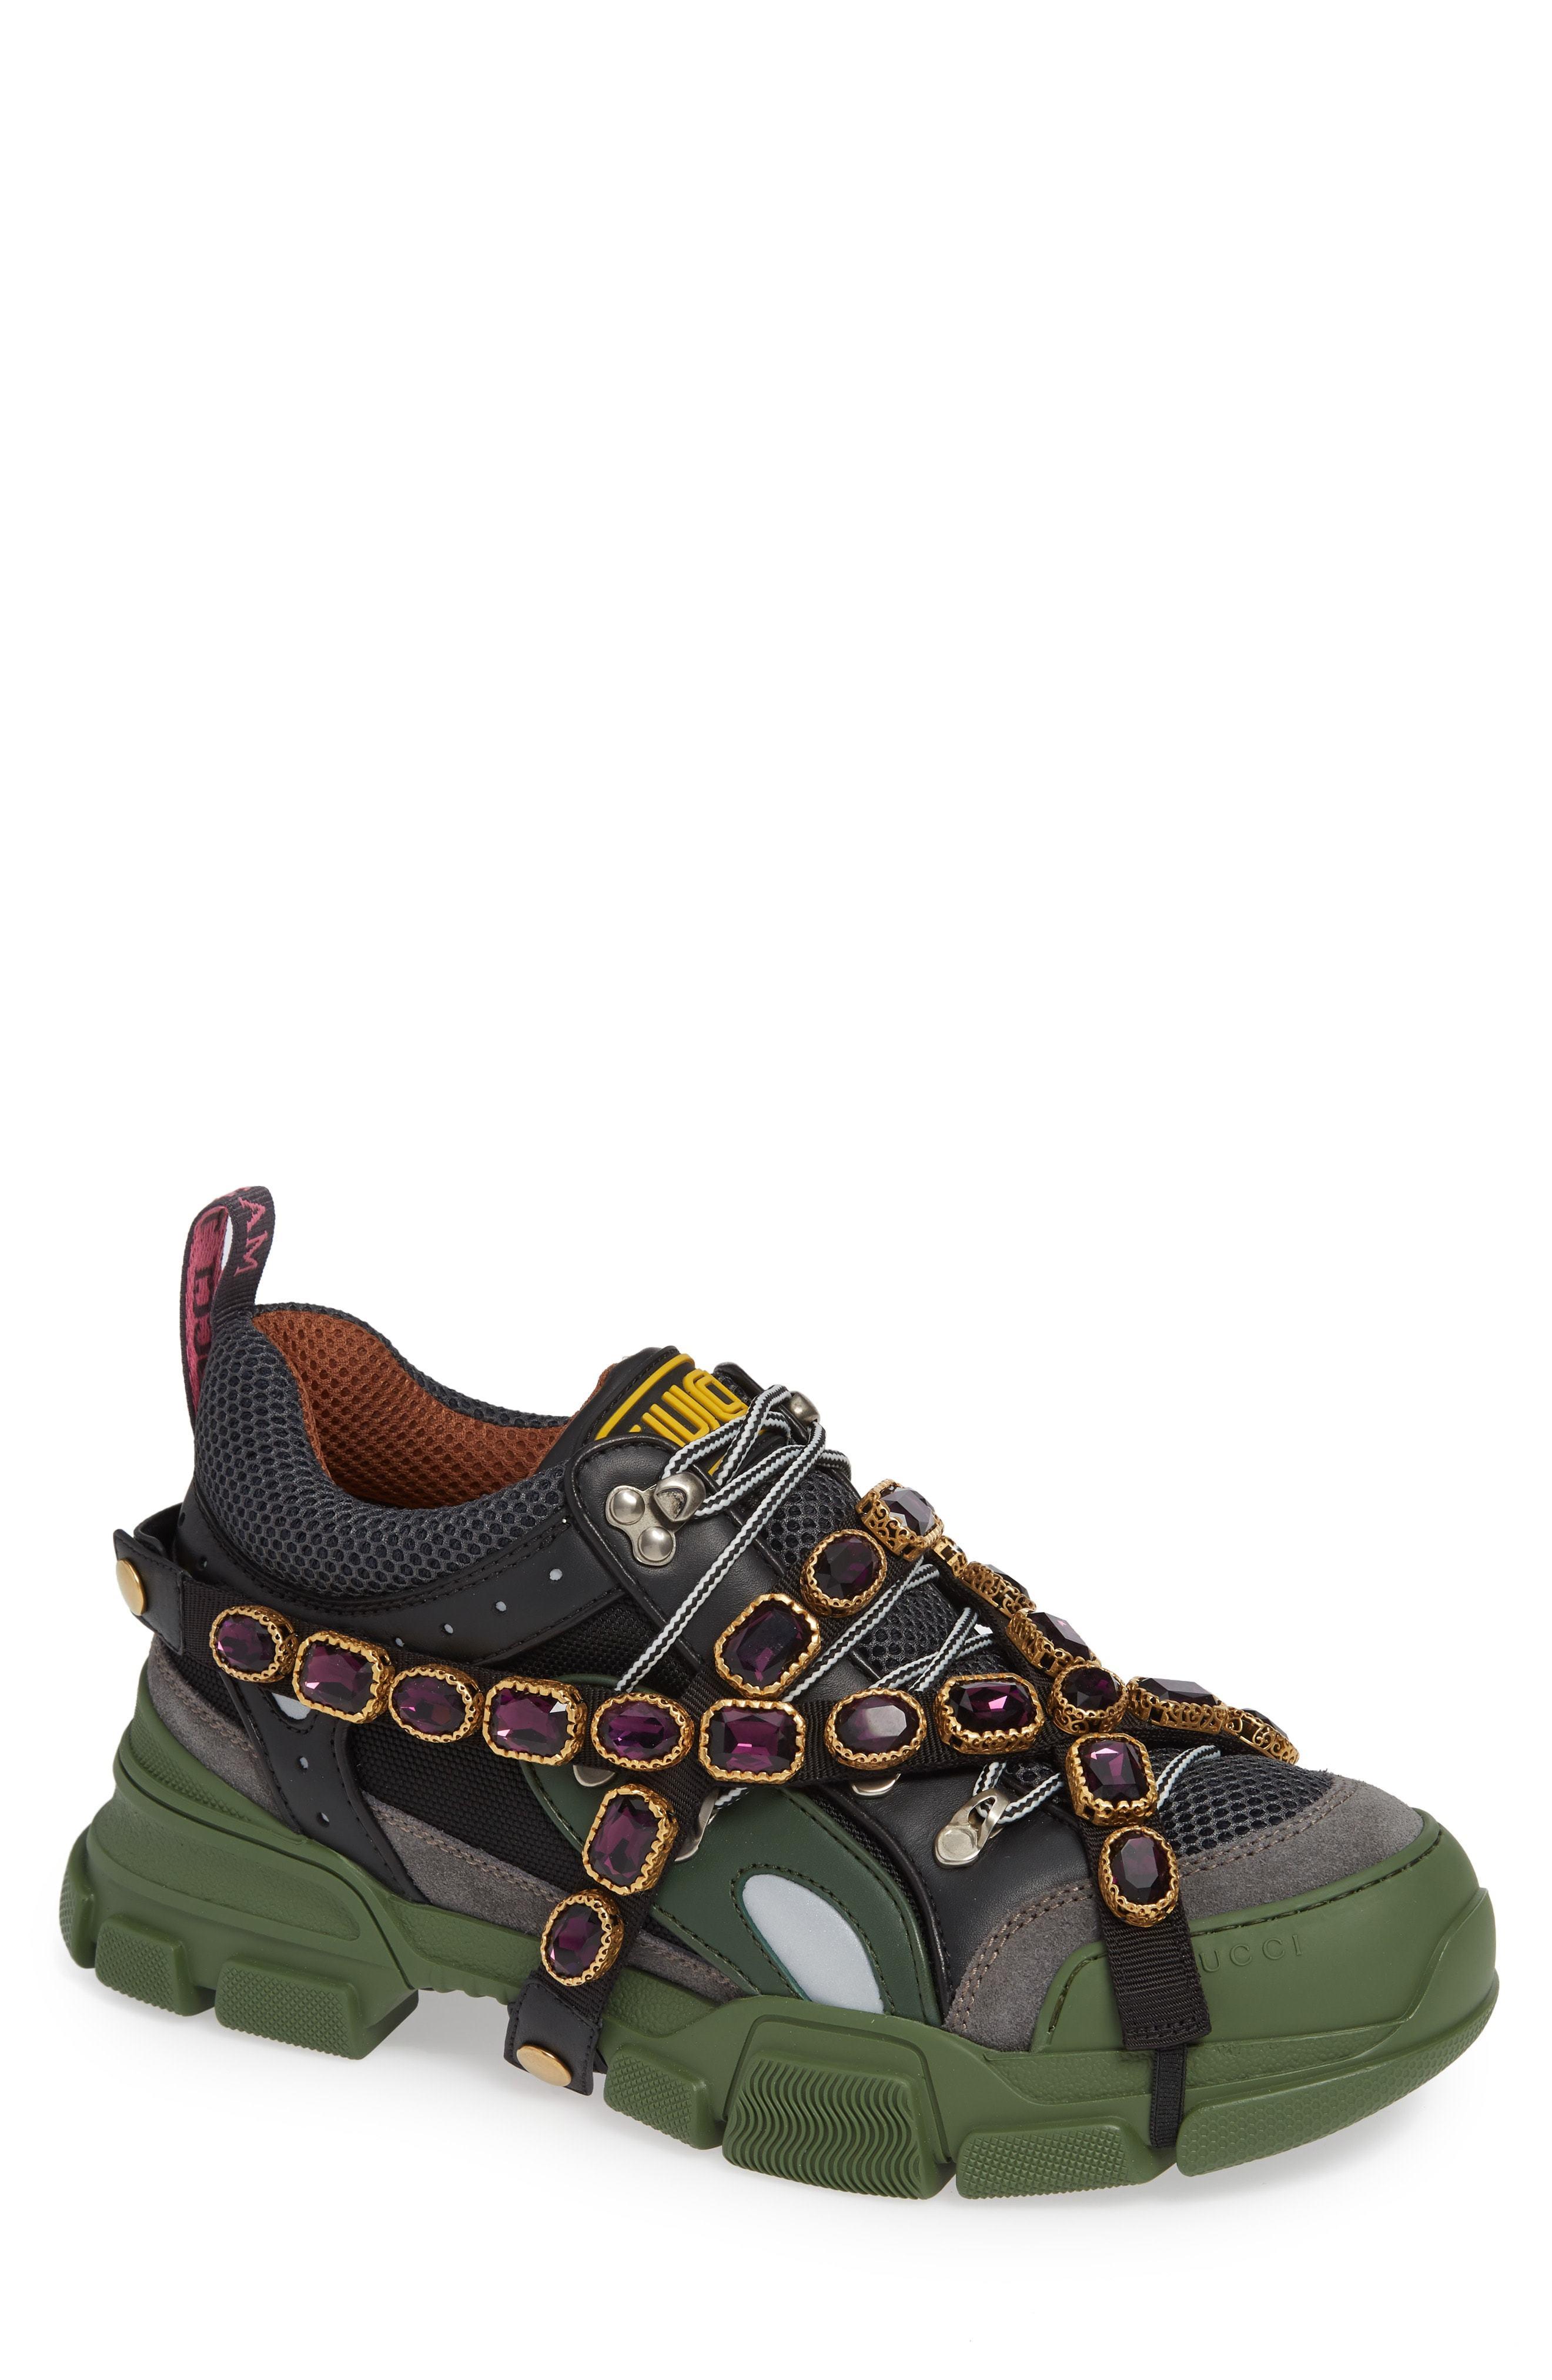 Gucci Journey Jewel Hiker Sneaker, $1